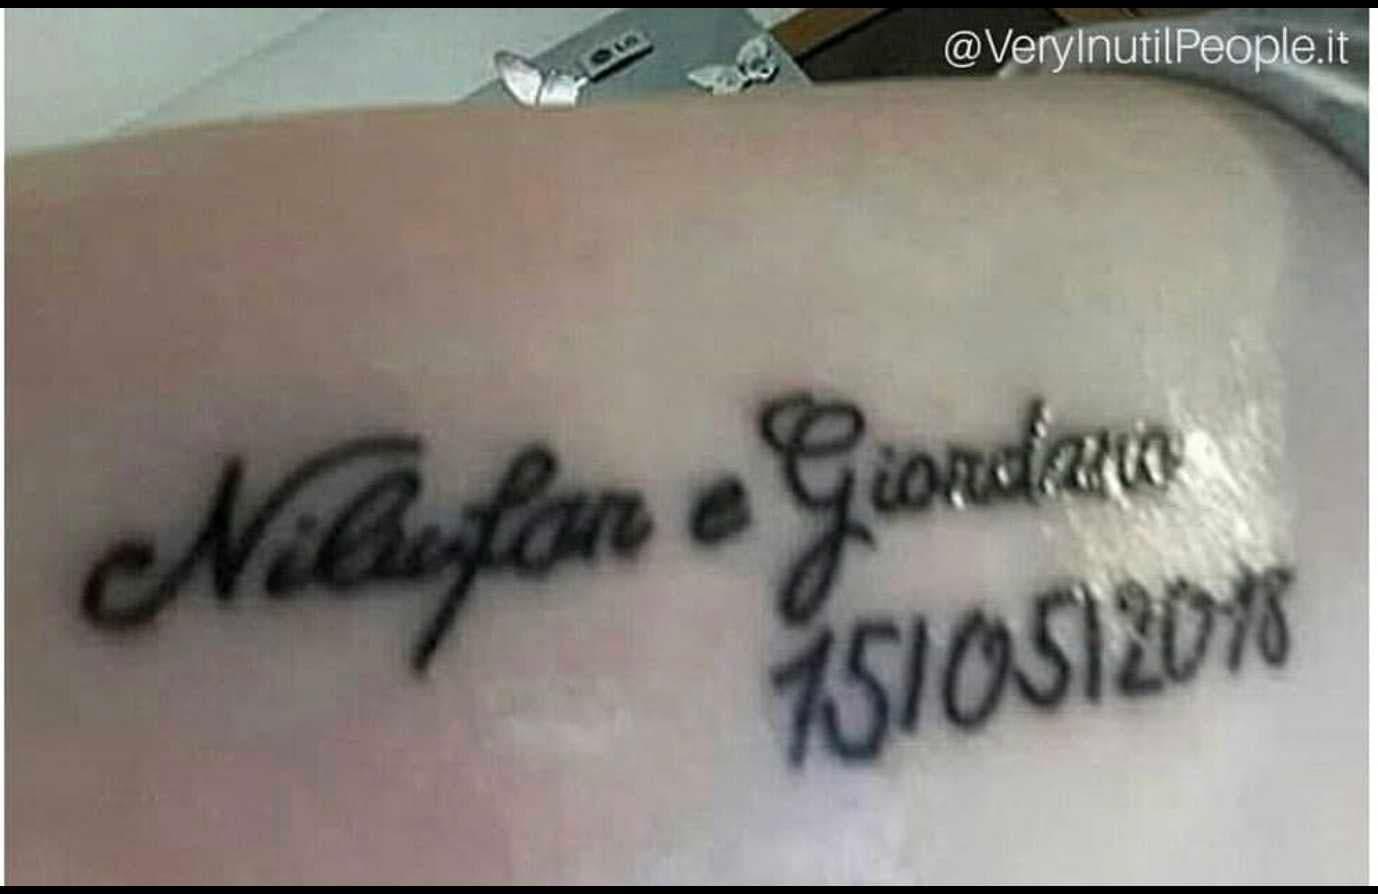 nilufar giordano tatuaggio